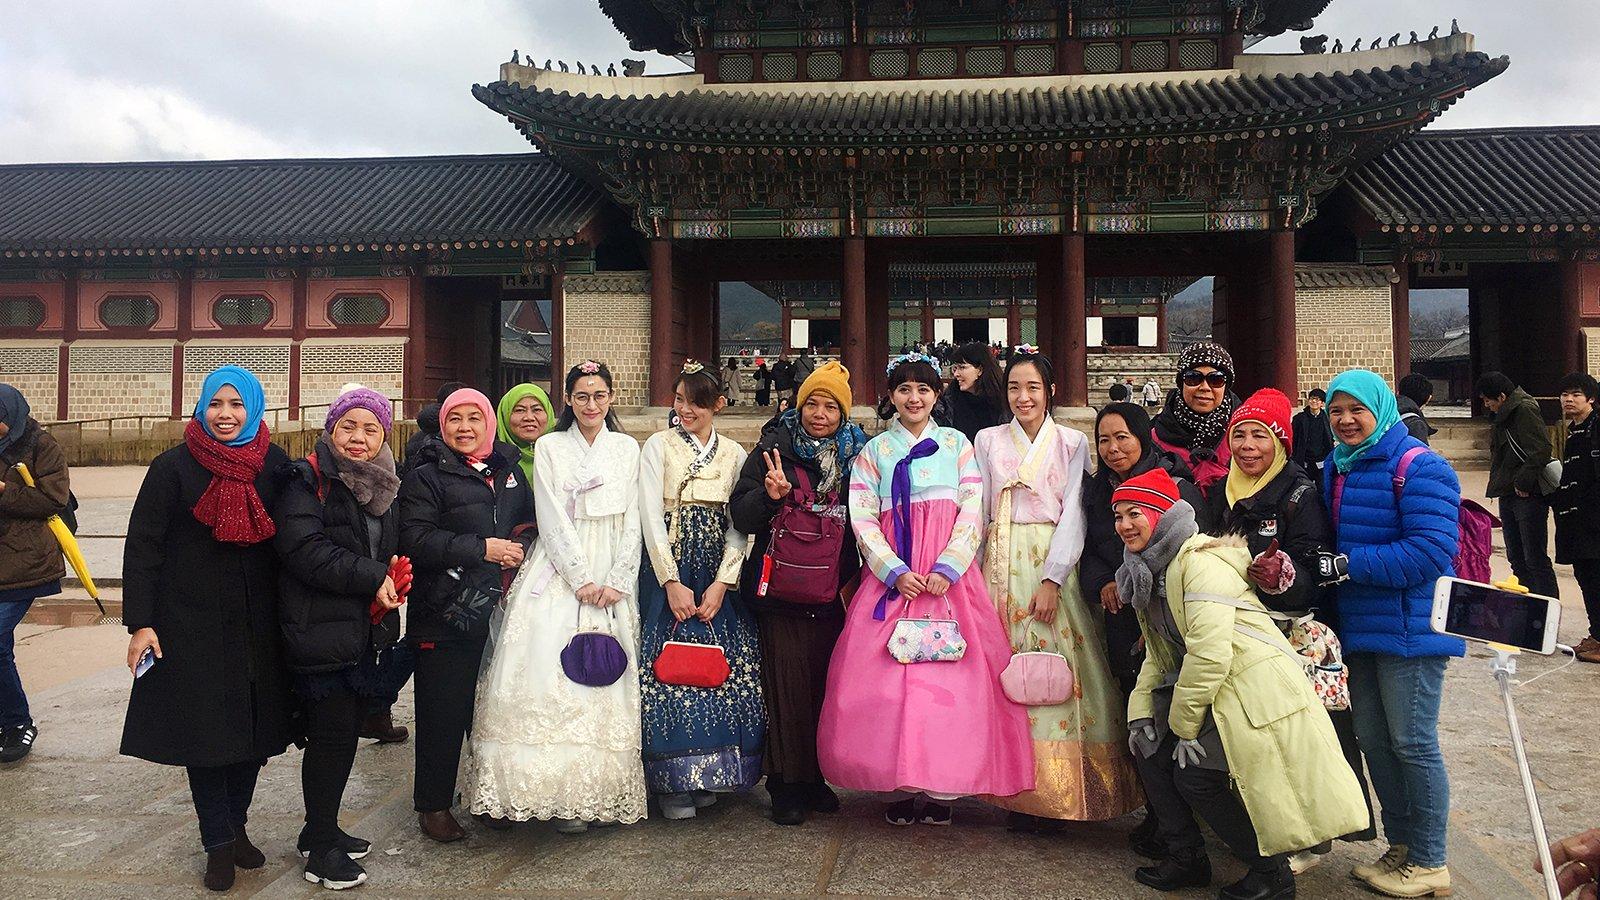 South Korea Courts Muslims To Fill Tourism Gap - Religion -1701